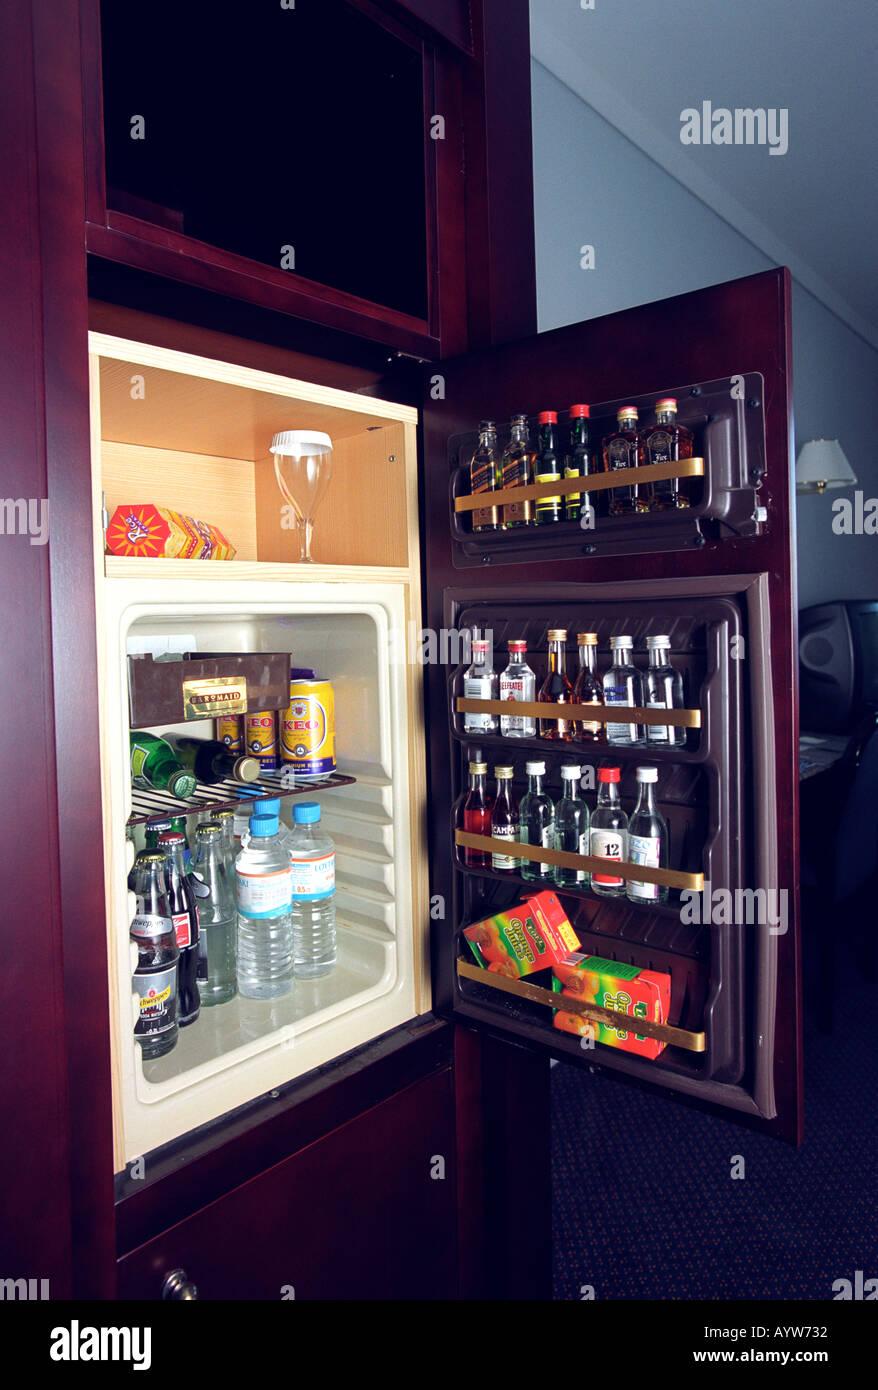 Hotel Minibar Stockfoto, Bild: 3200817 - Alamy